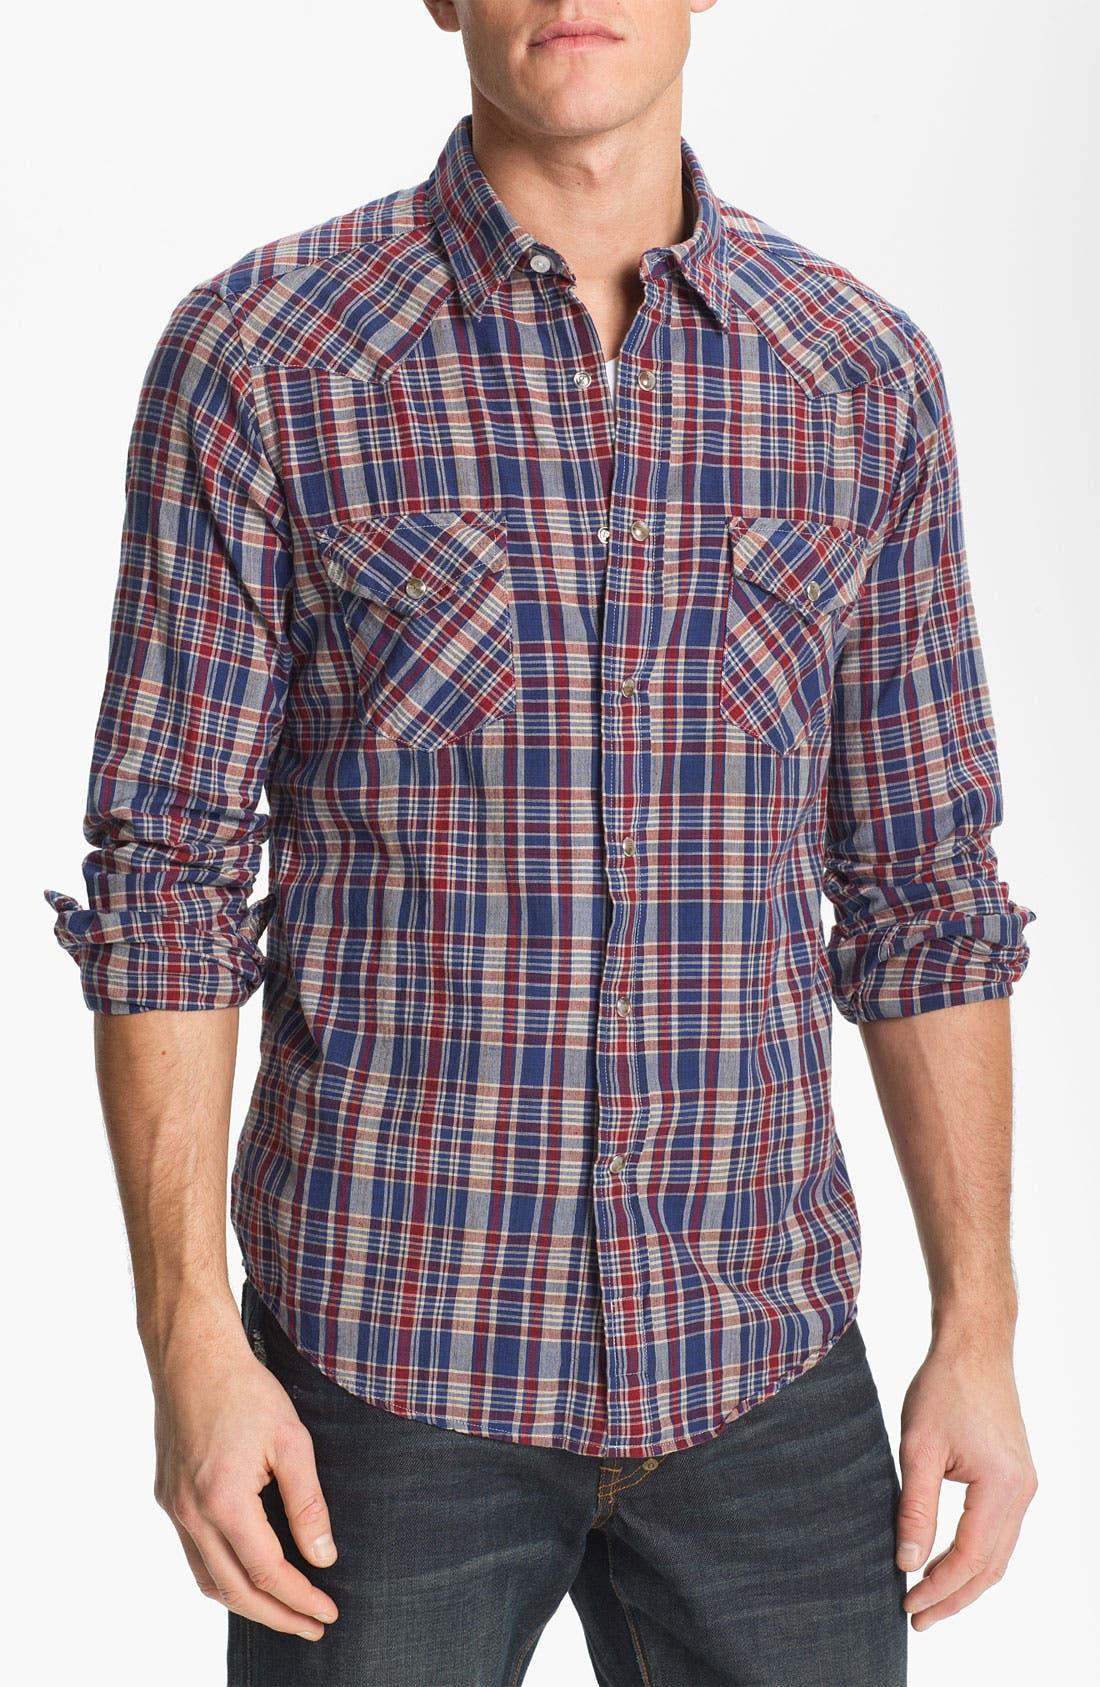 Alternate Image 1 Selected - Pendleton 'Epic' Madras Plaid Western Shirt